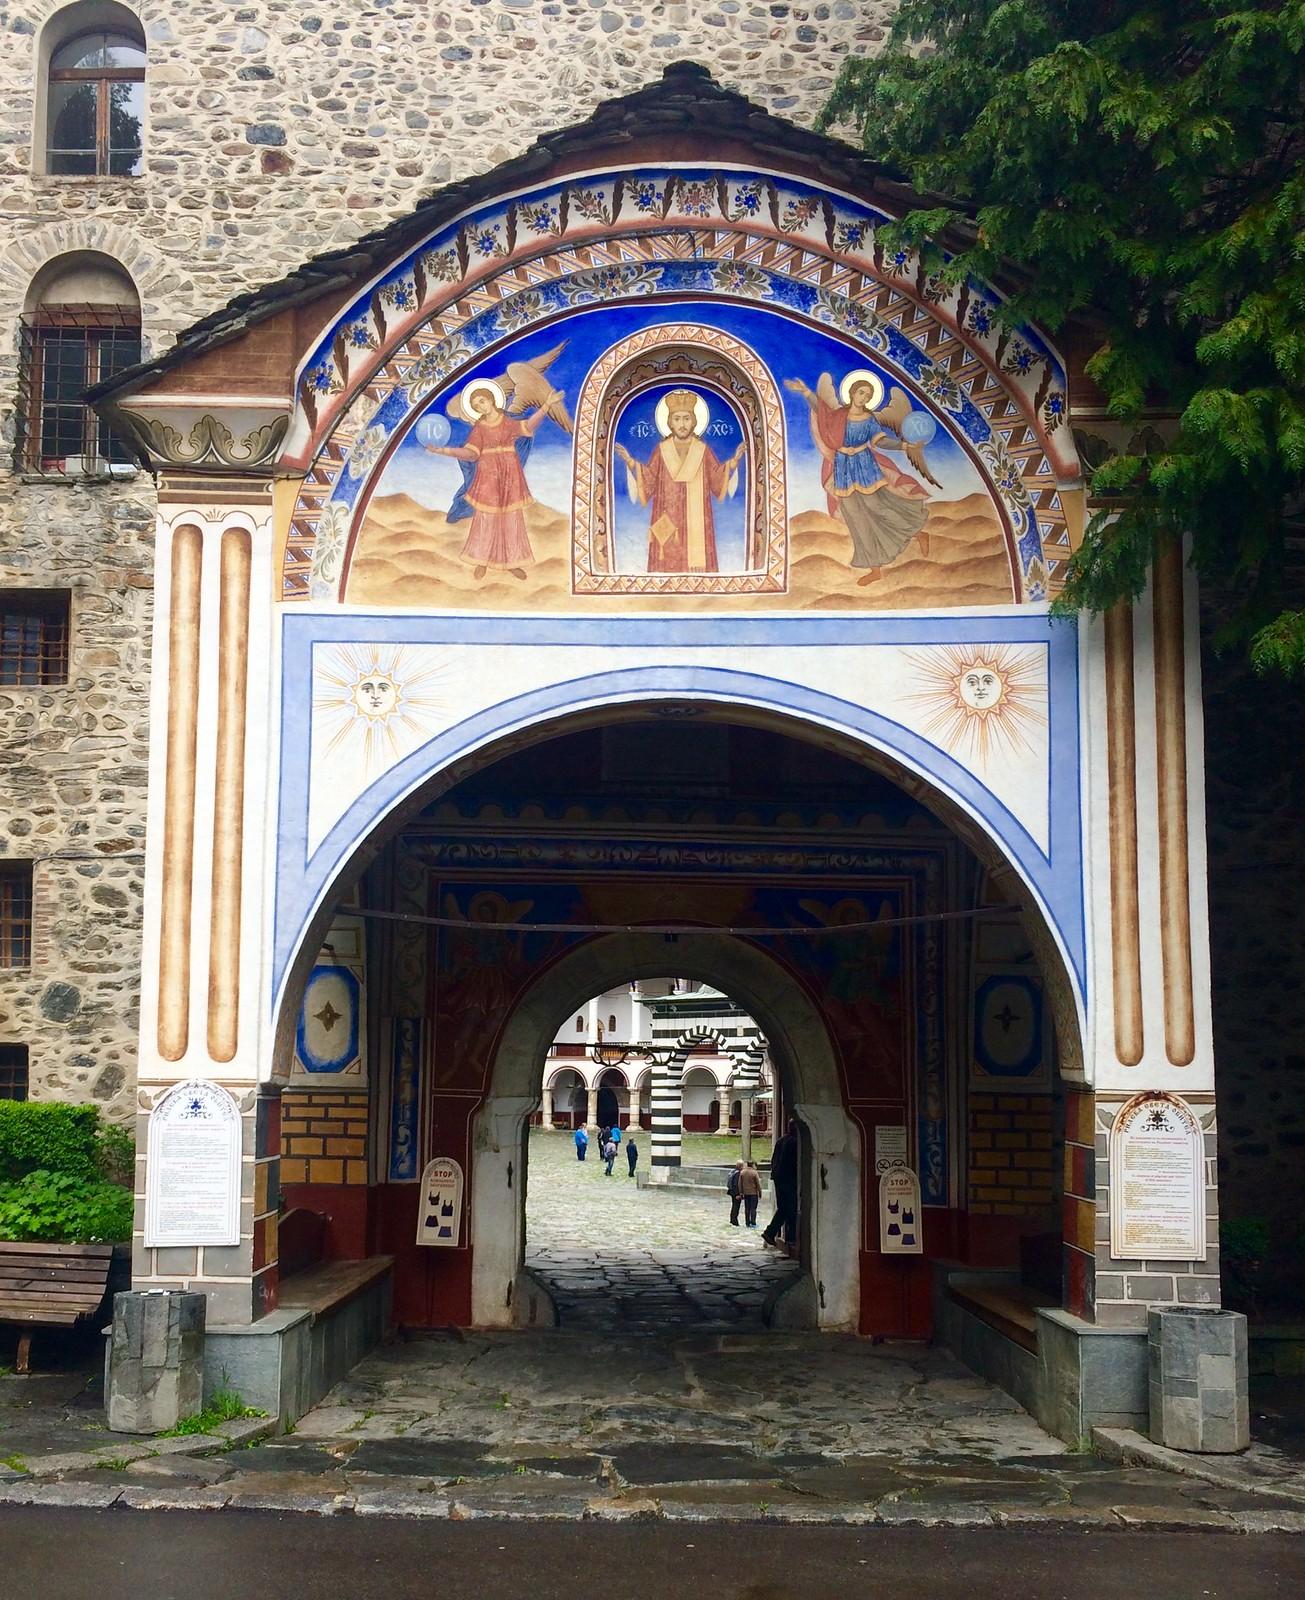 201705 - Balkans - Rila Monastery Entrance - 19 of 66 - Rila Monastery - Rilski manastir, May 26, 2017